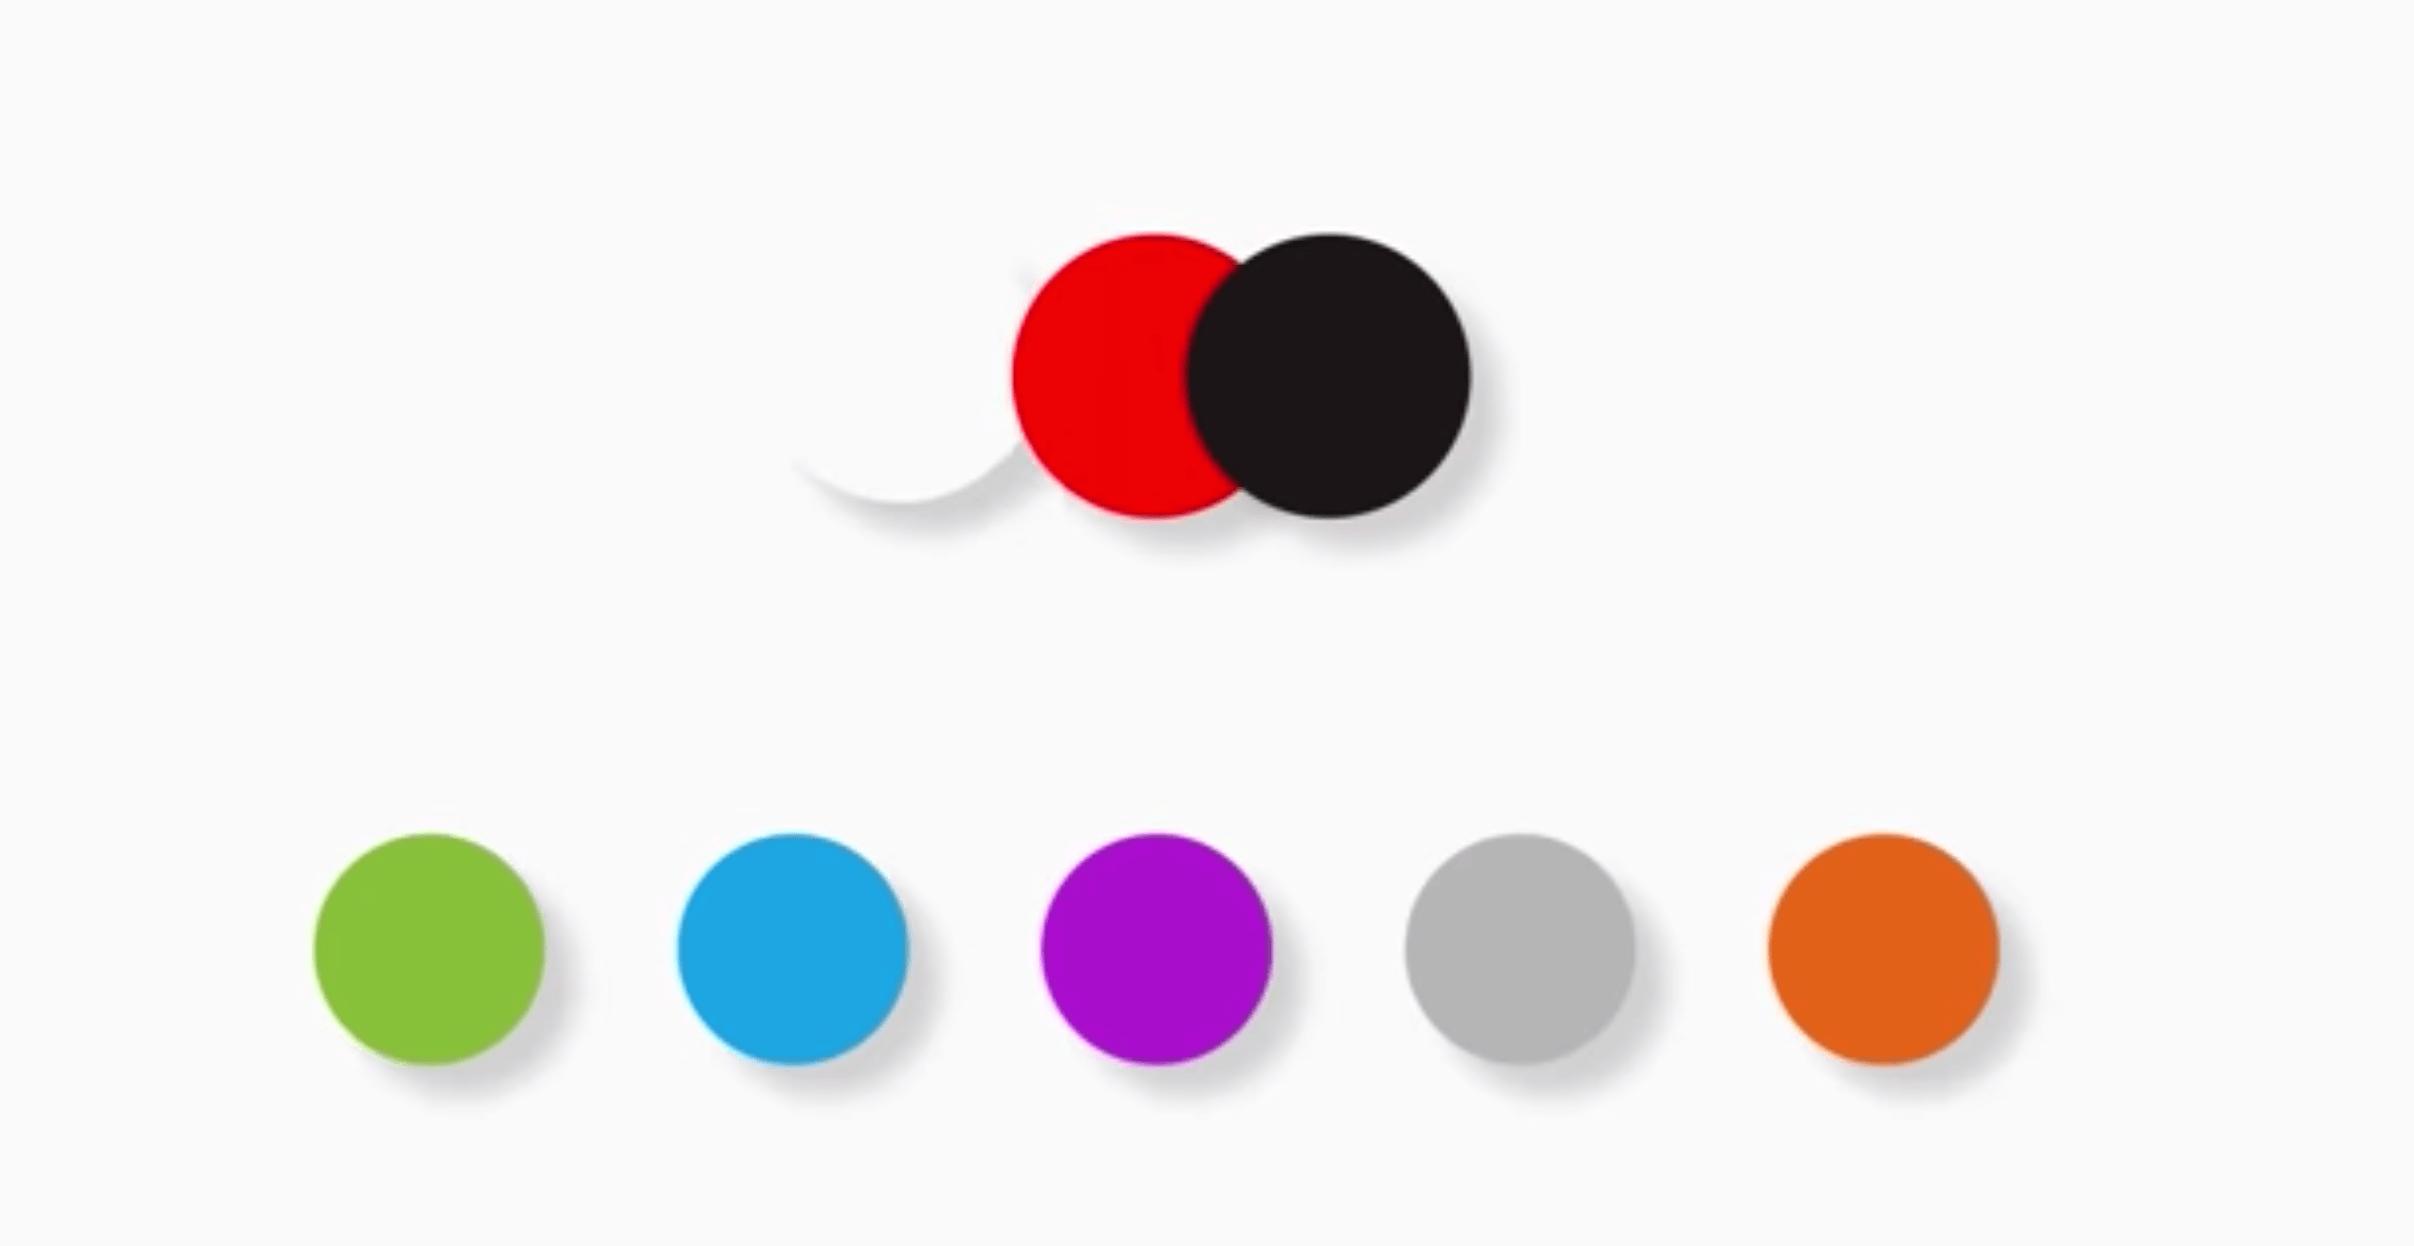 youtube-seo-tips-colors